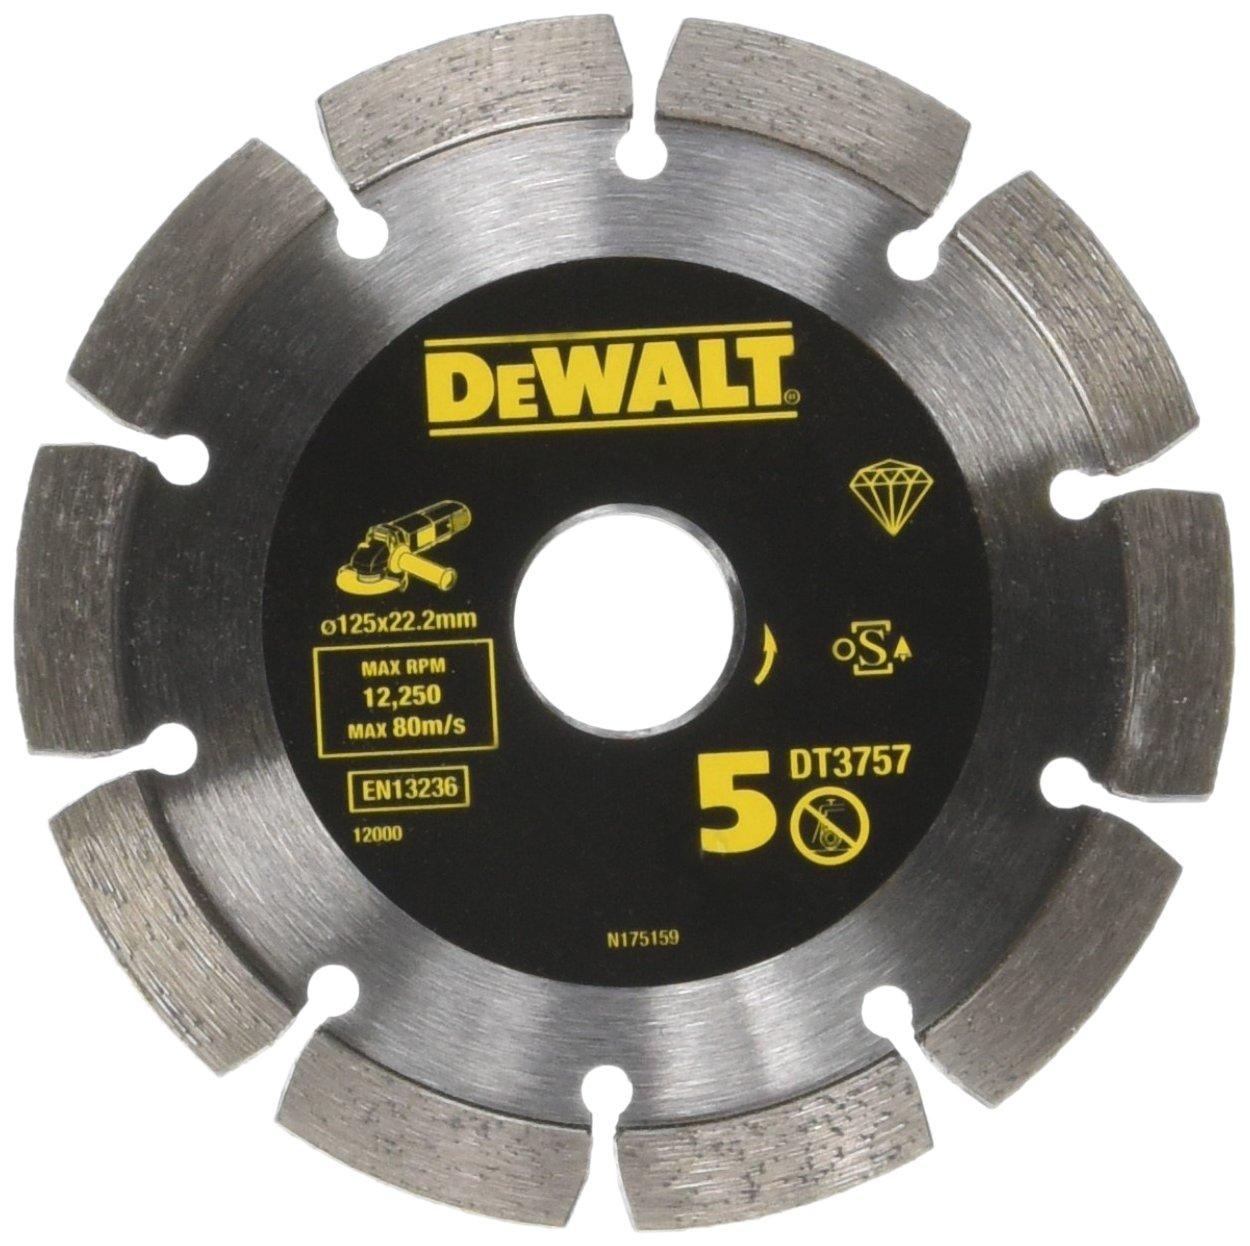 Irwin 10505934 115 x 22.2mm Continuous Diamond Disc